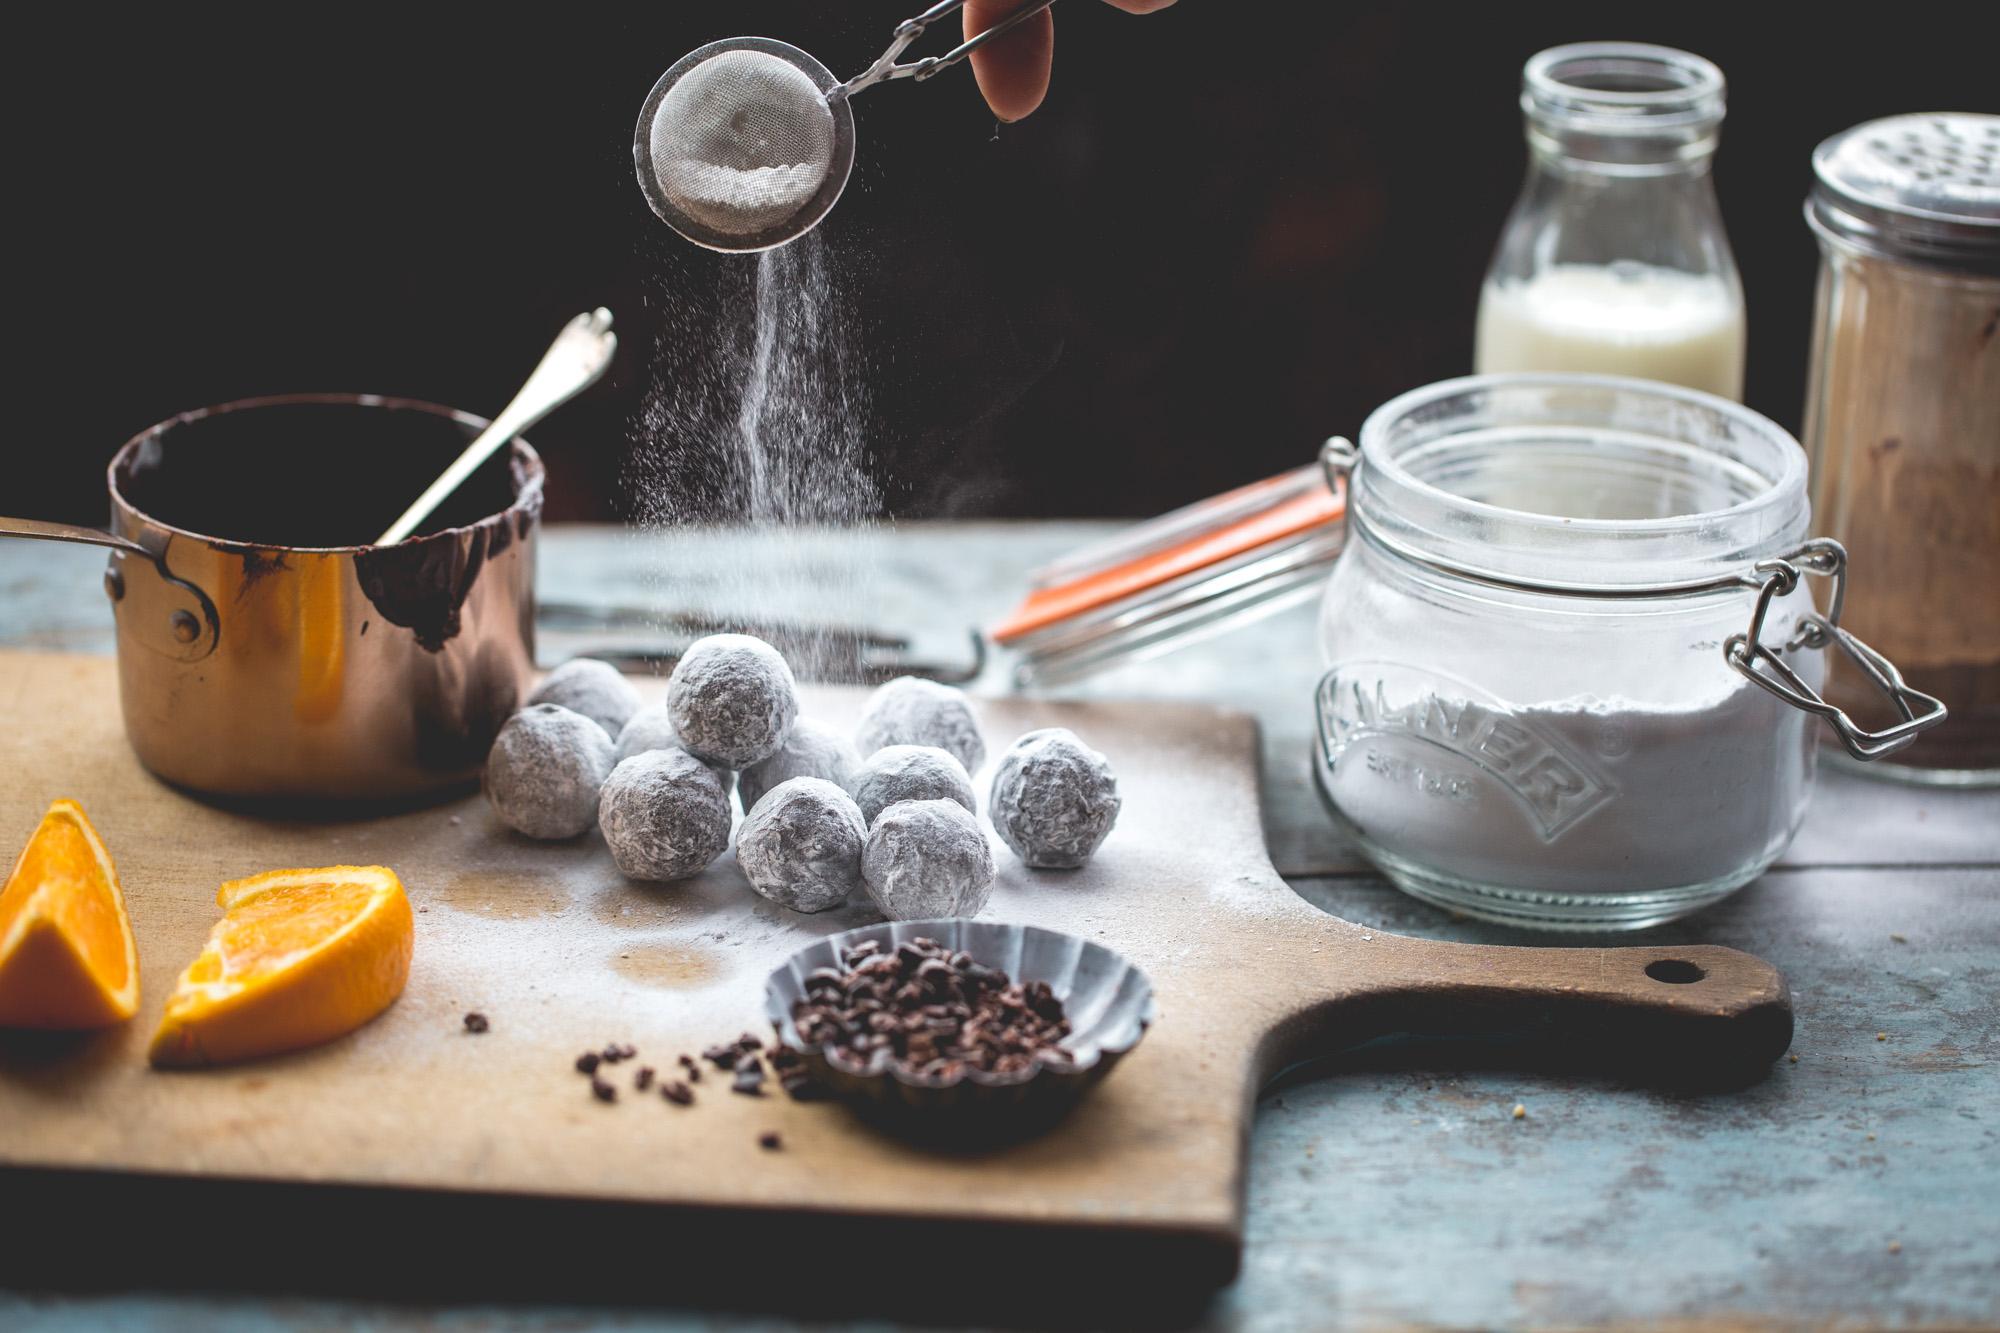 Home made dark chococlate and orange truffles